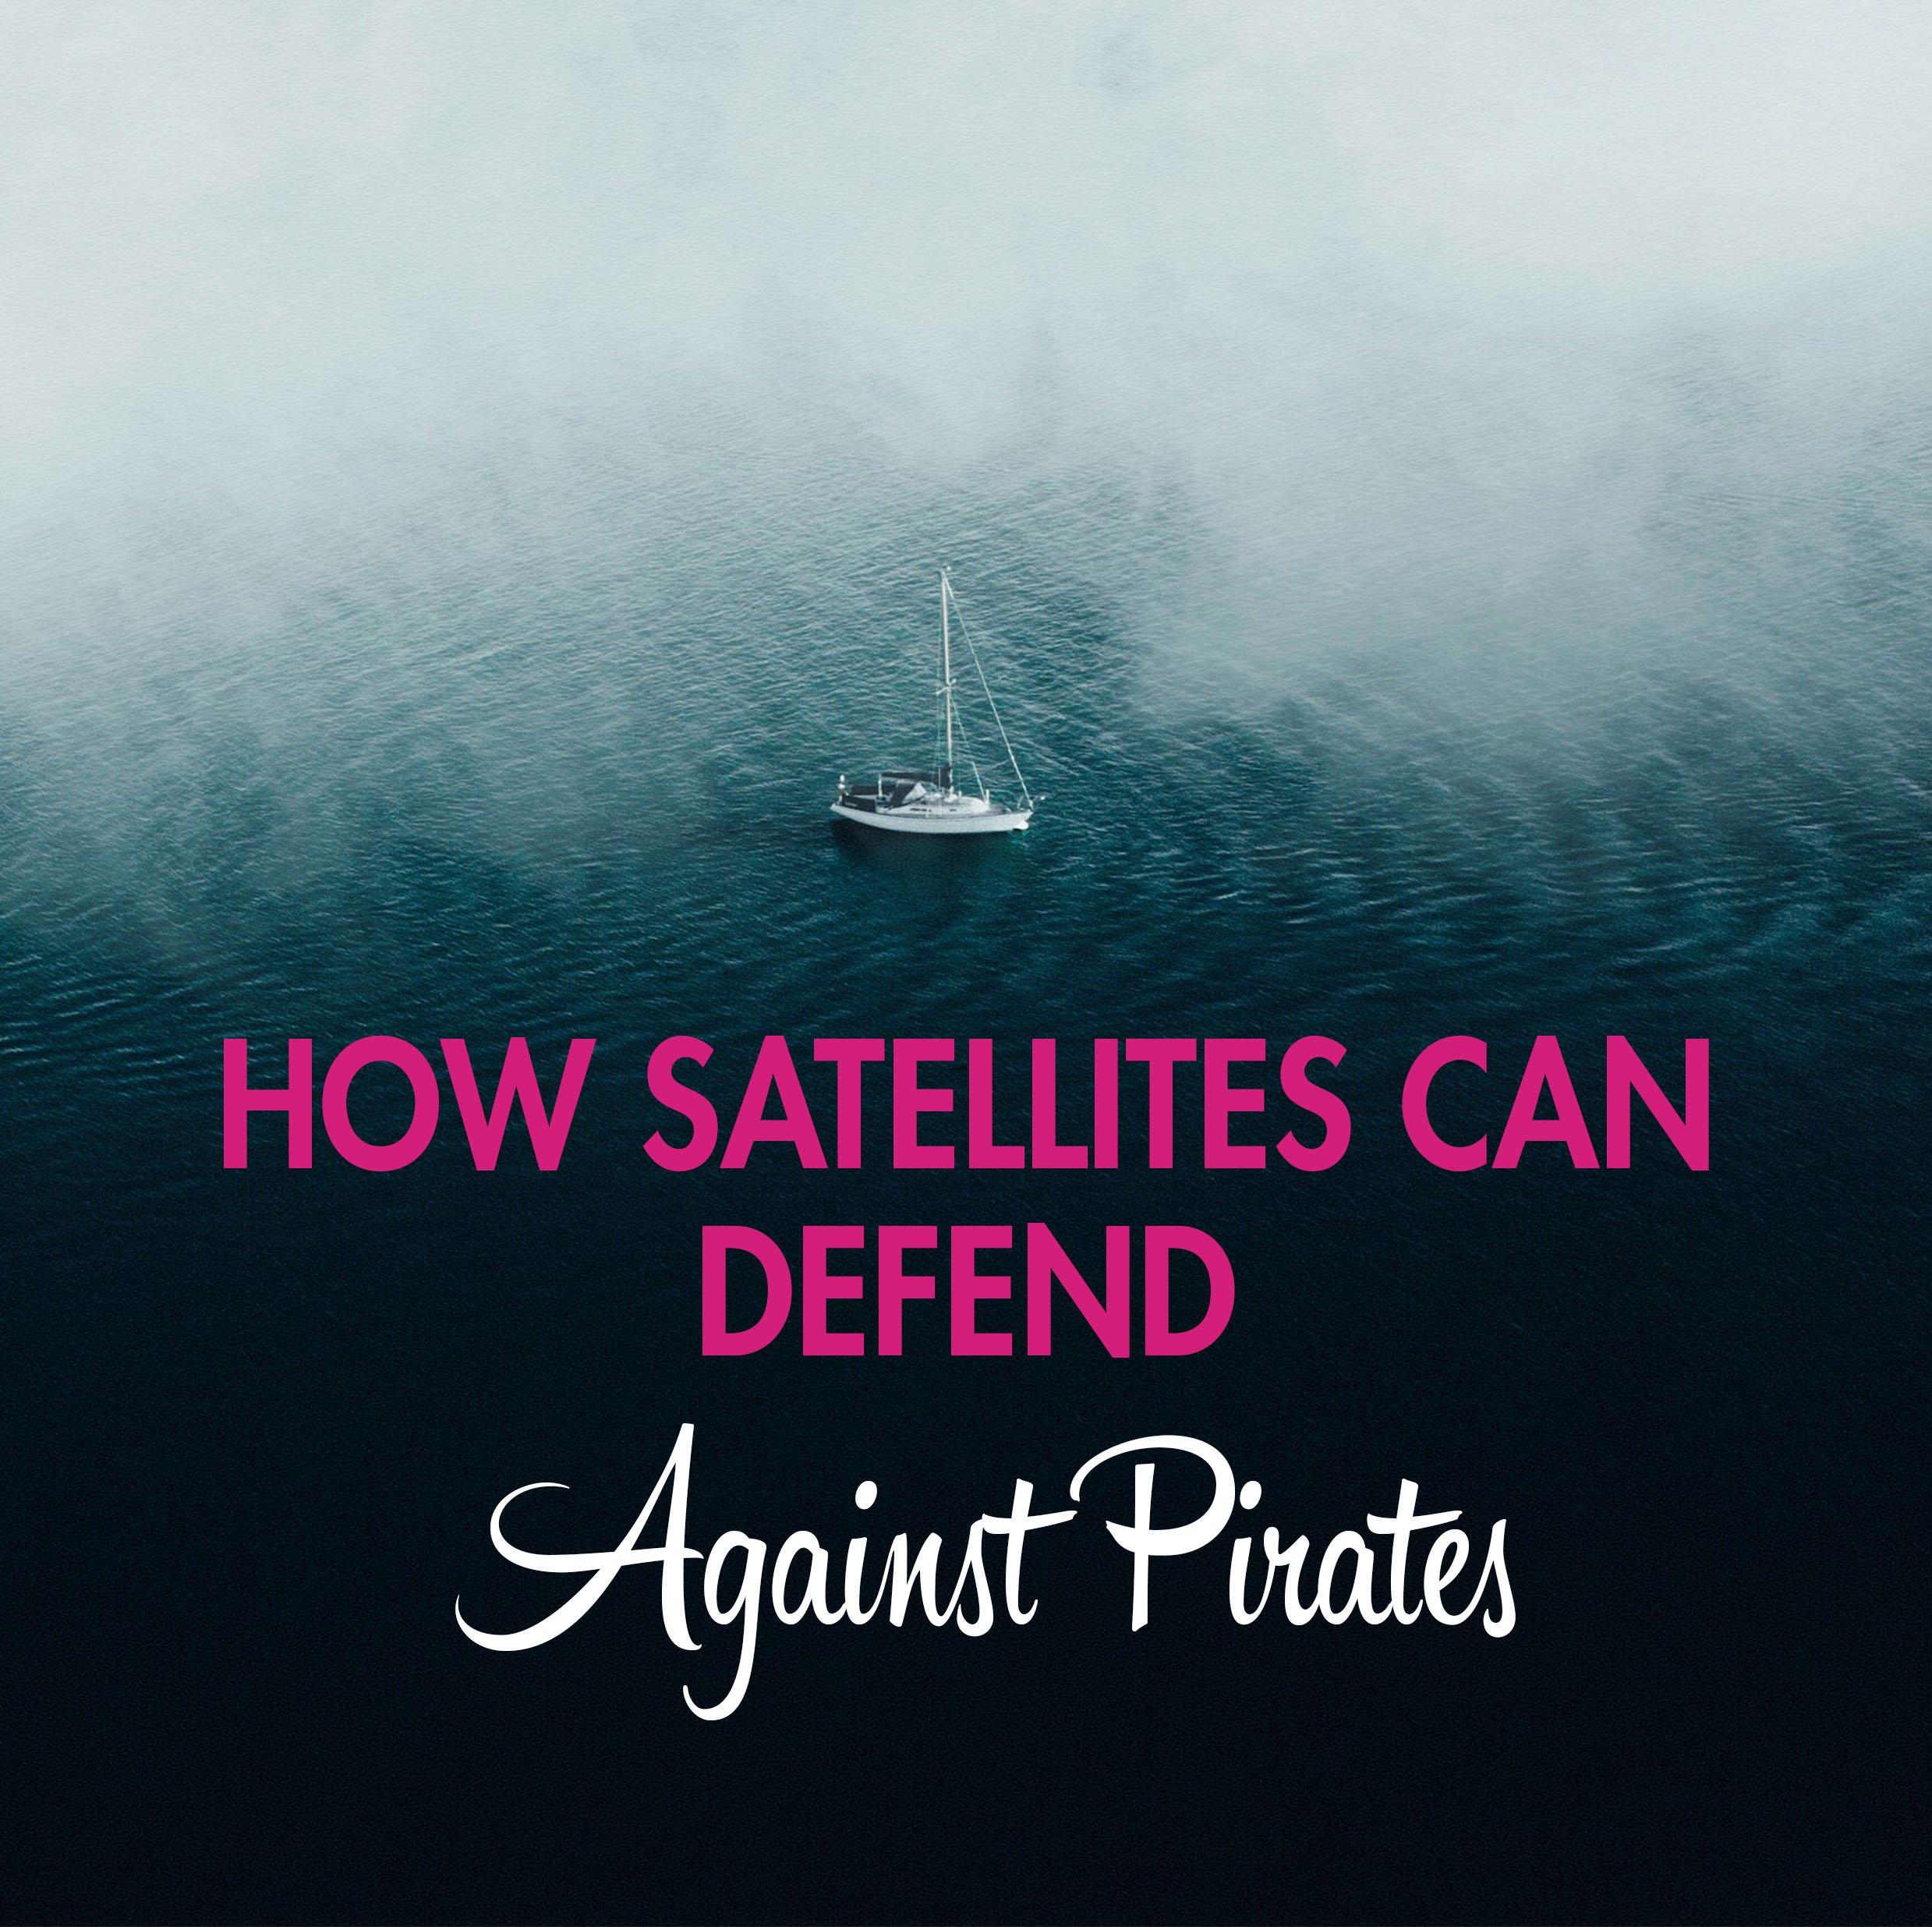 how satellites can defend against pirates-1